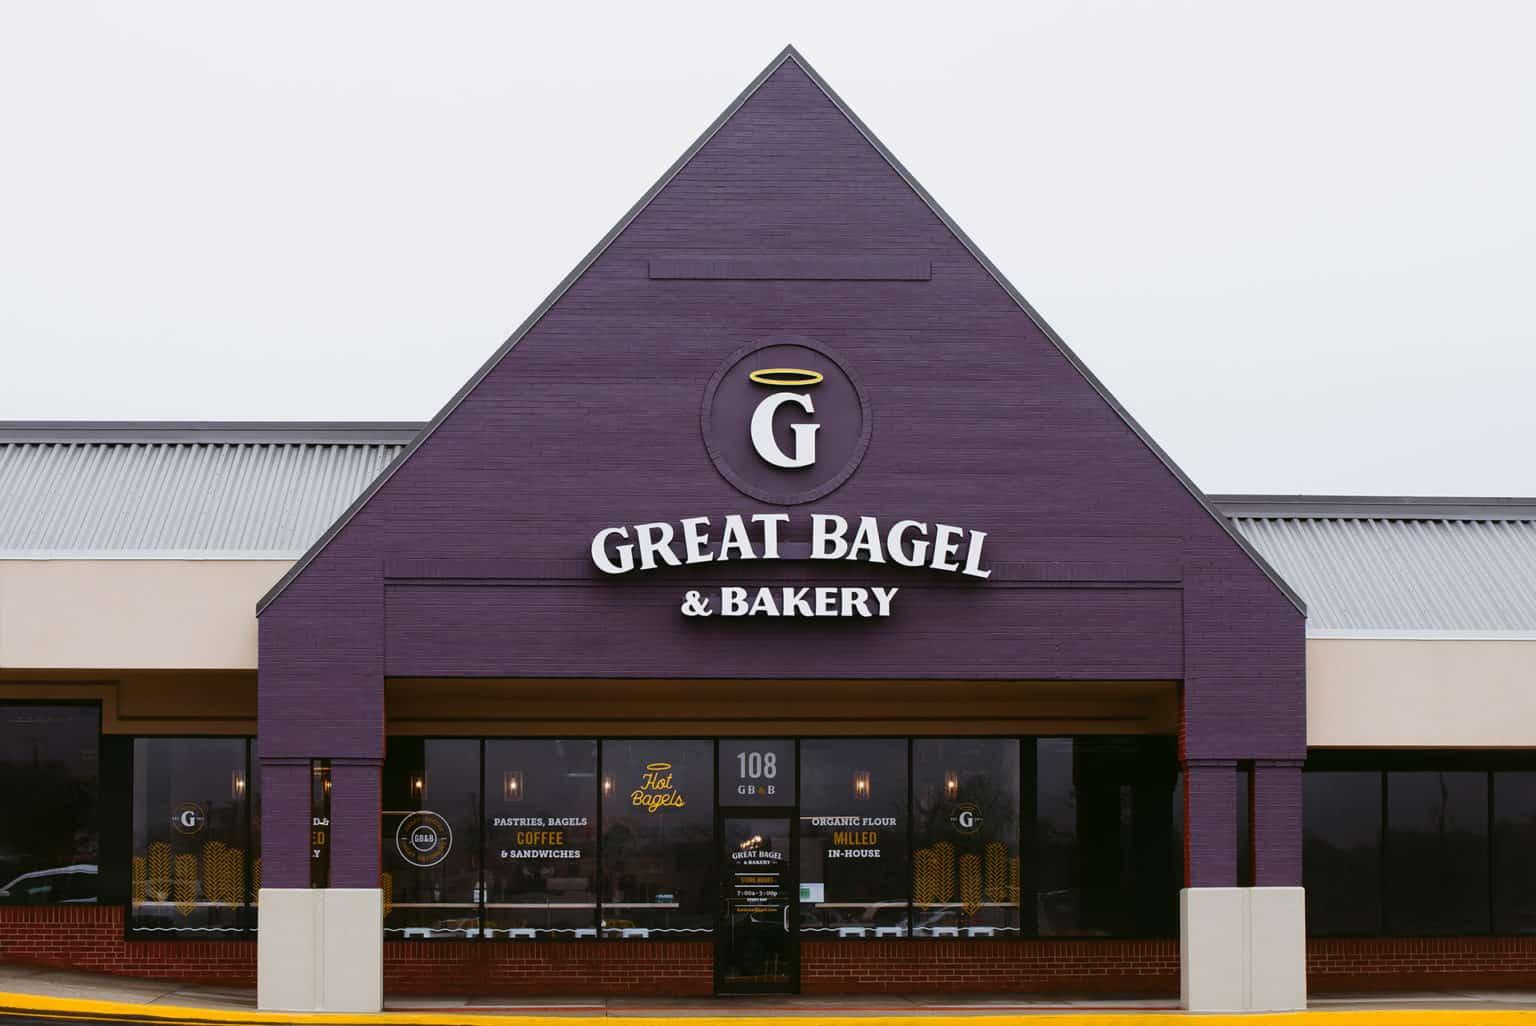 Great Bagel & Bakery restaurant rebranding and interior design